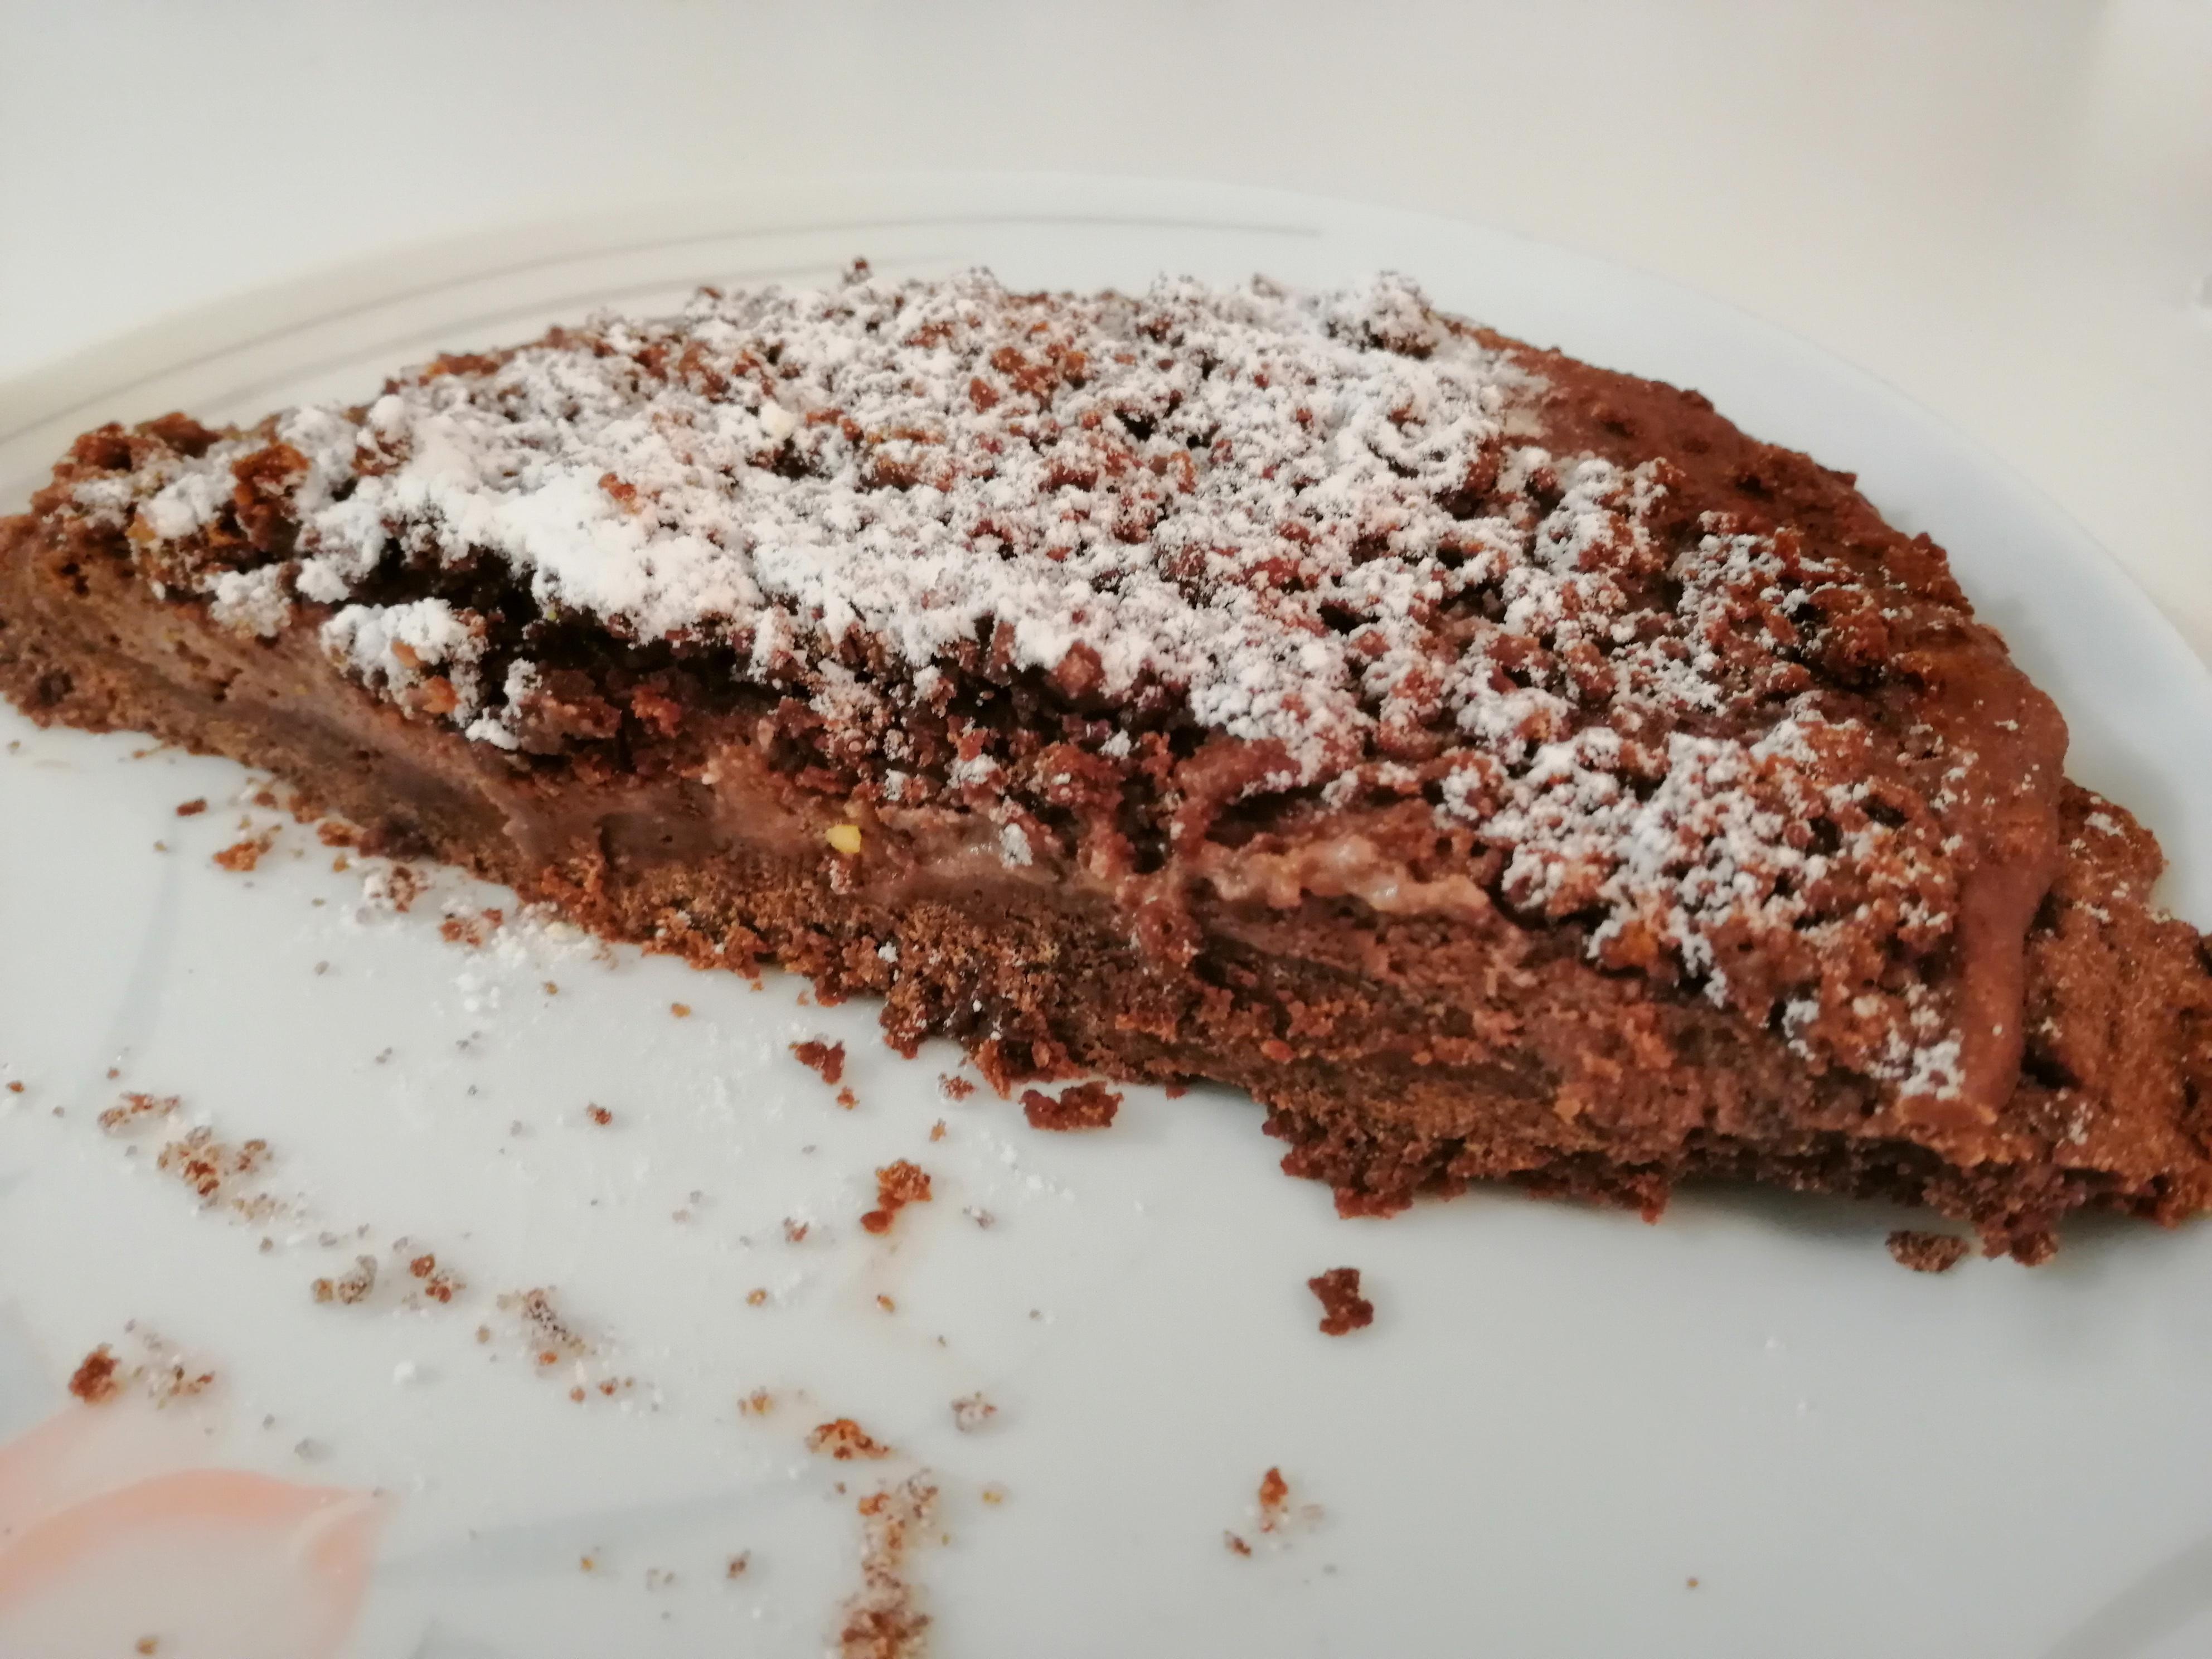 Sbriciolata al cioccolato